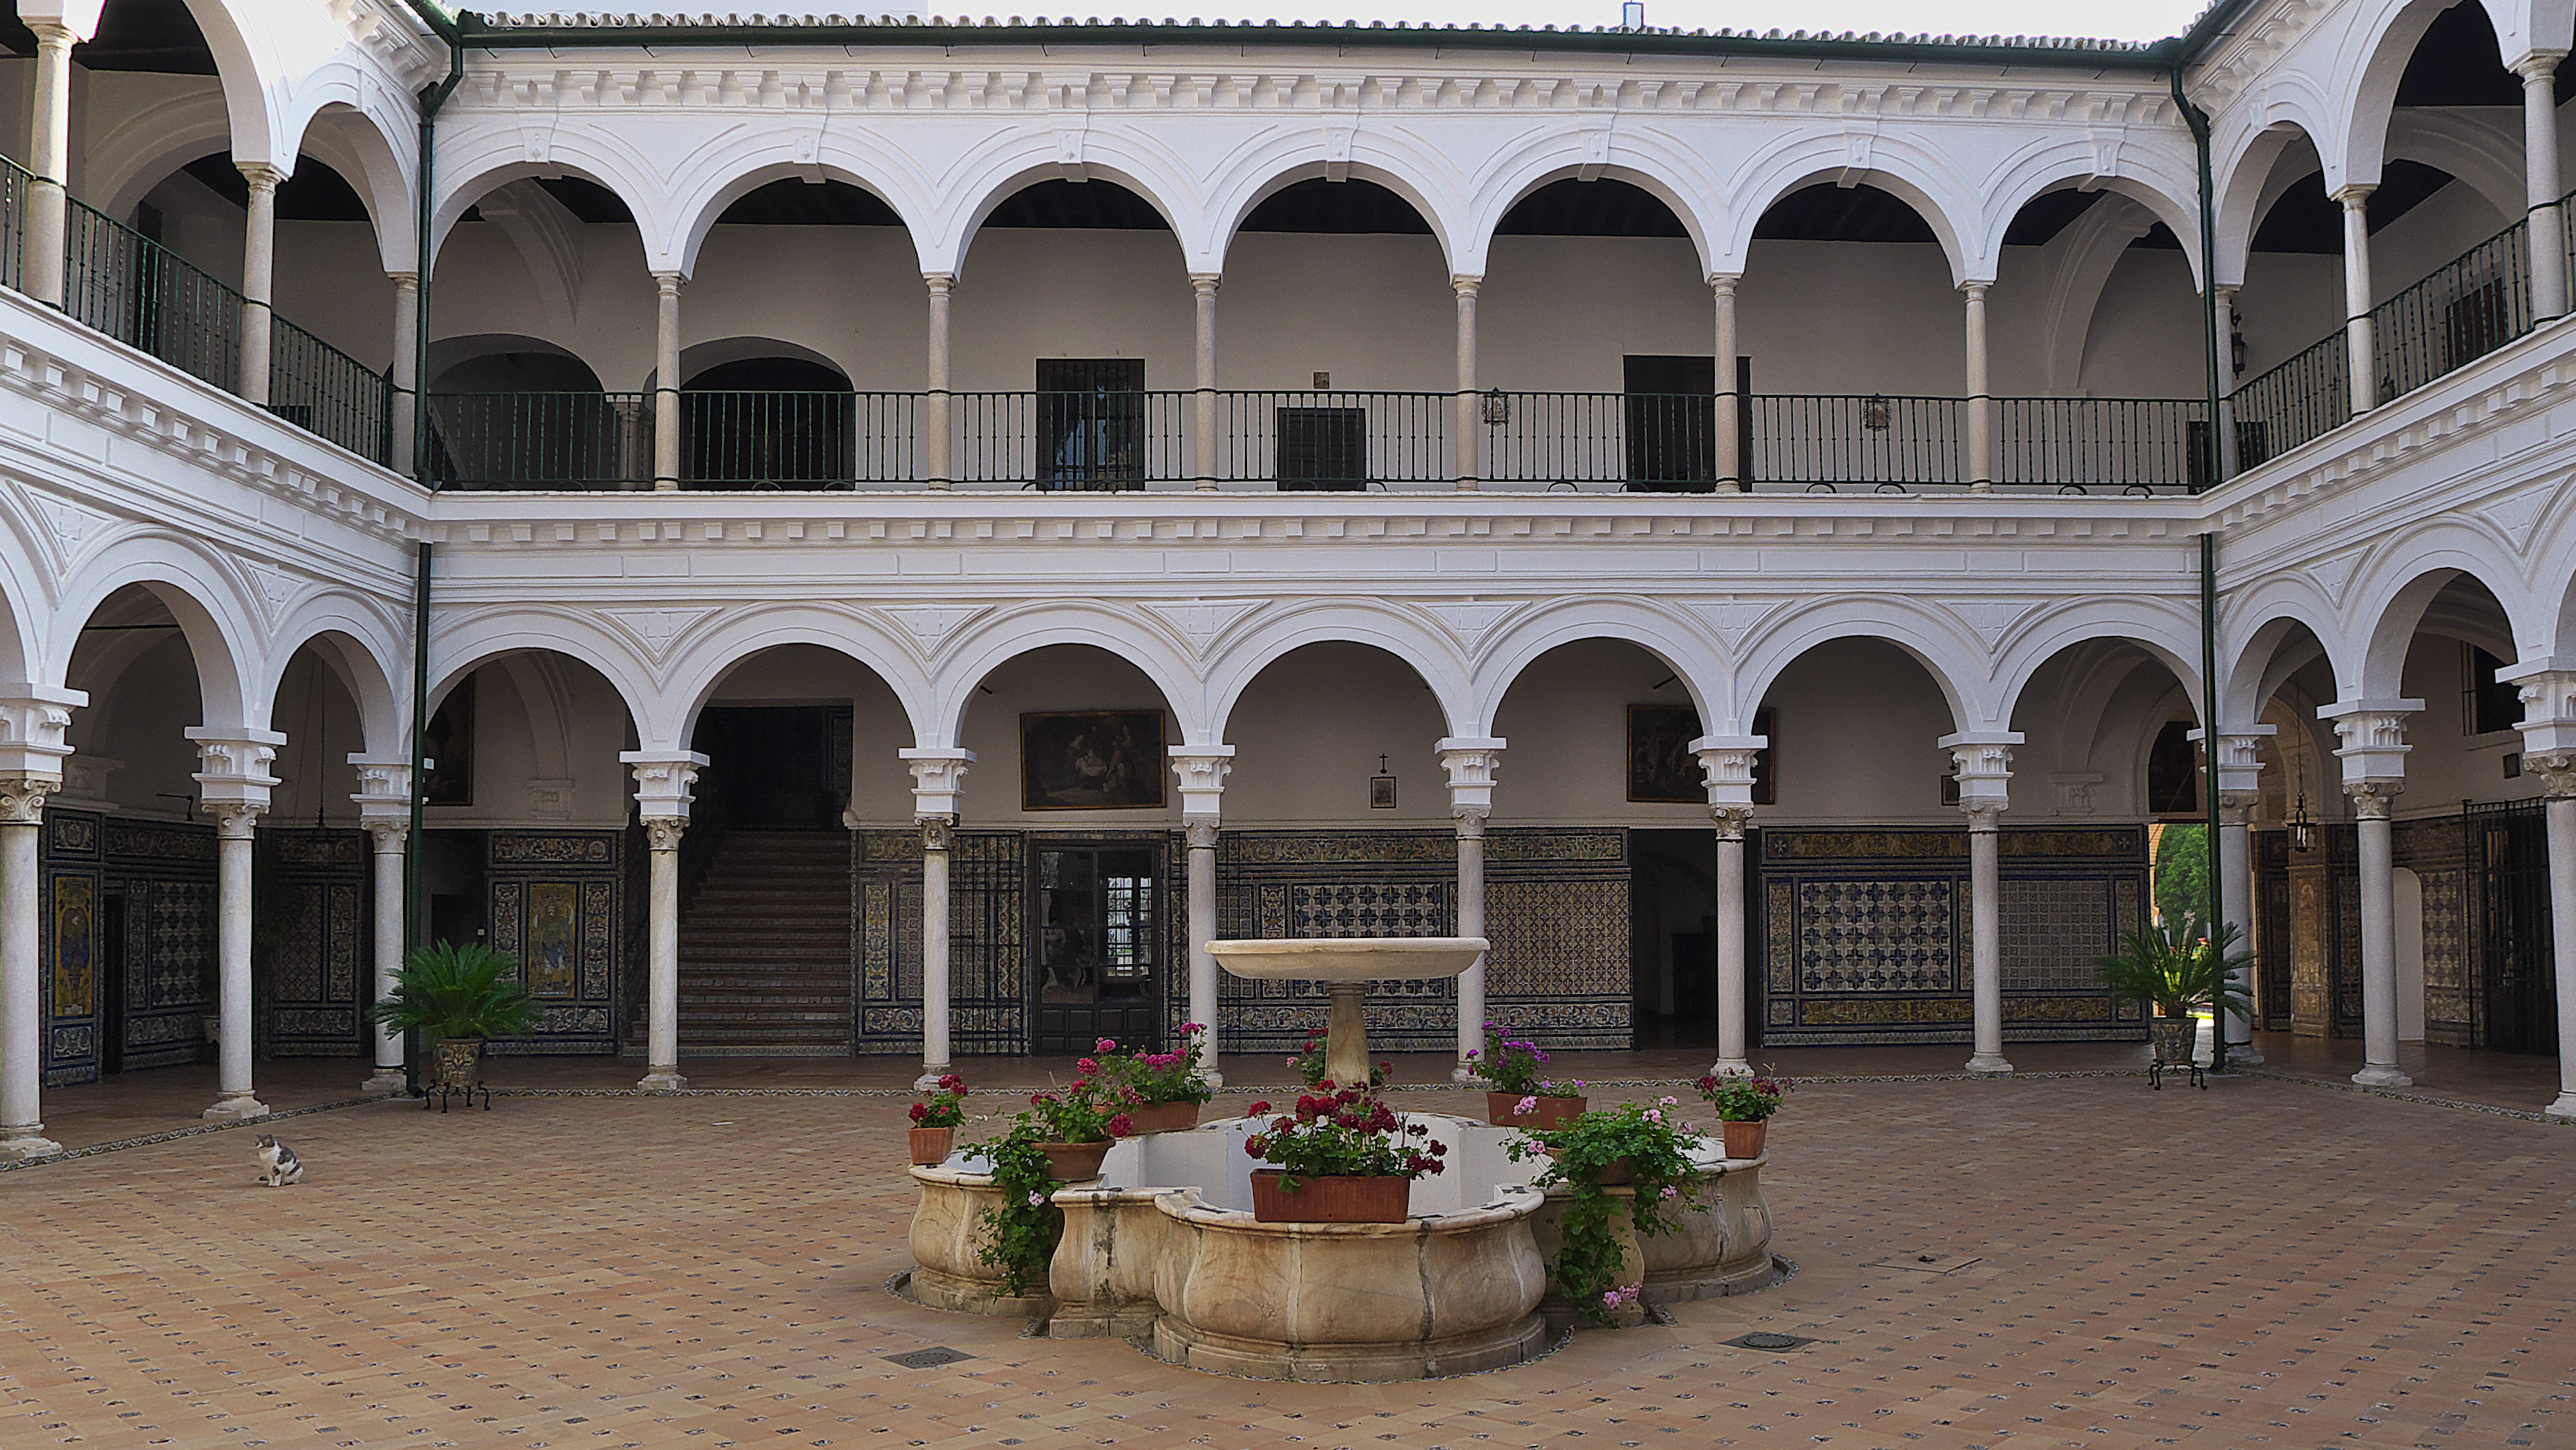 Monasterio_de_Santa_Paula_Sevilla._Claustro